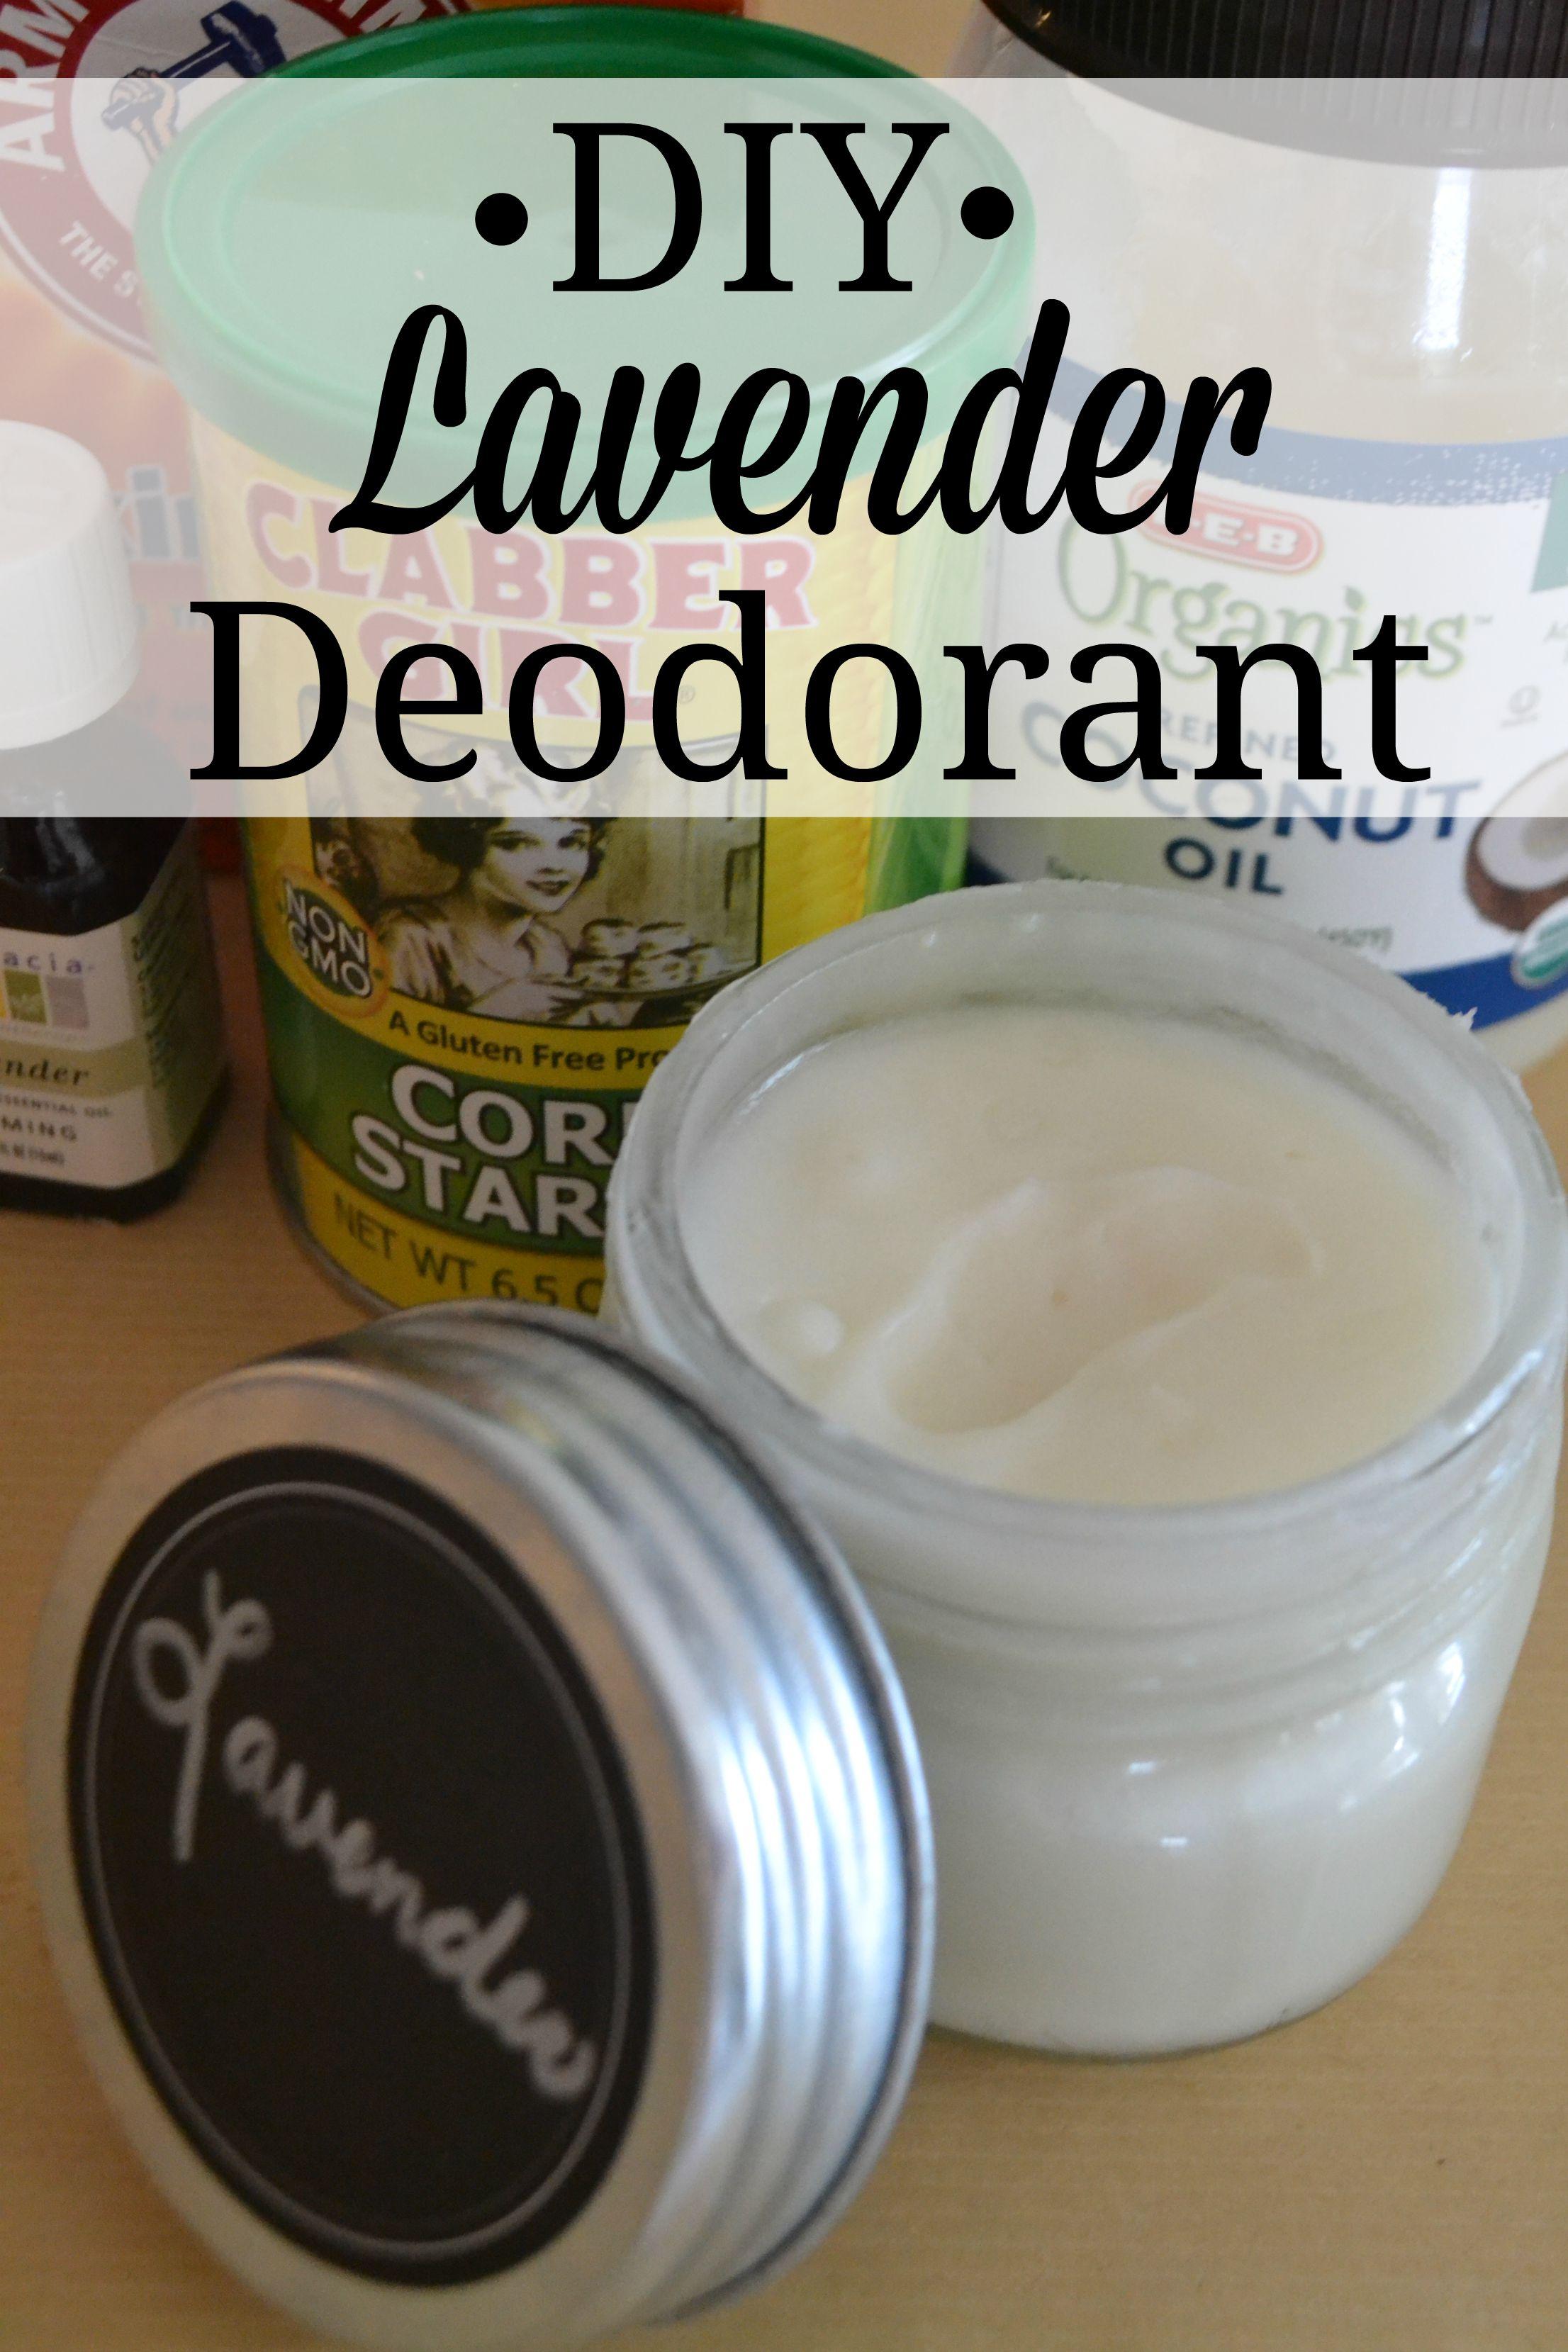 DIY Lavender Deodorant